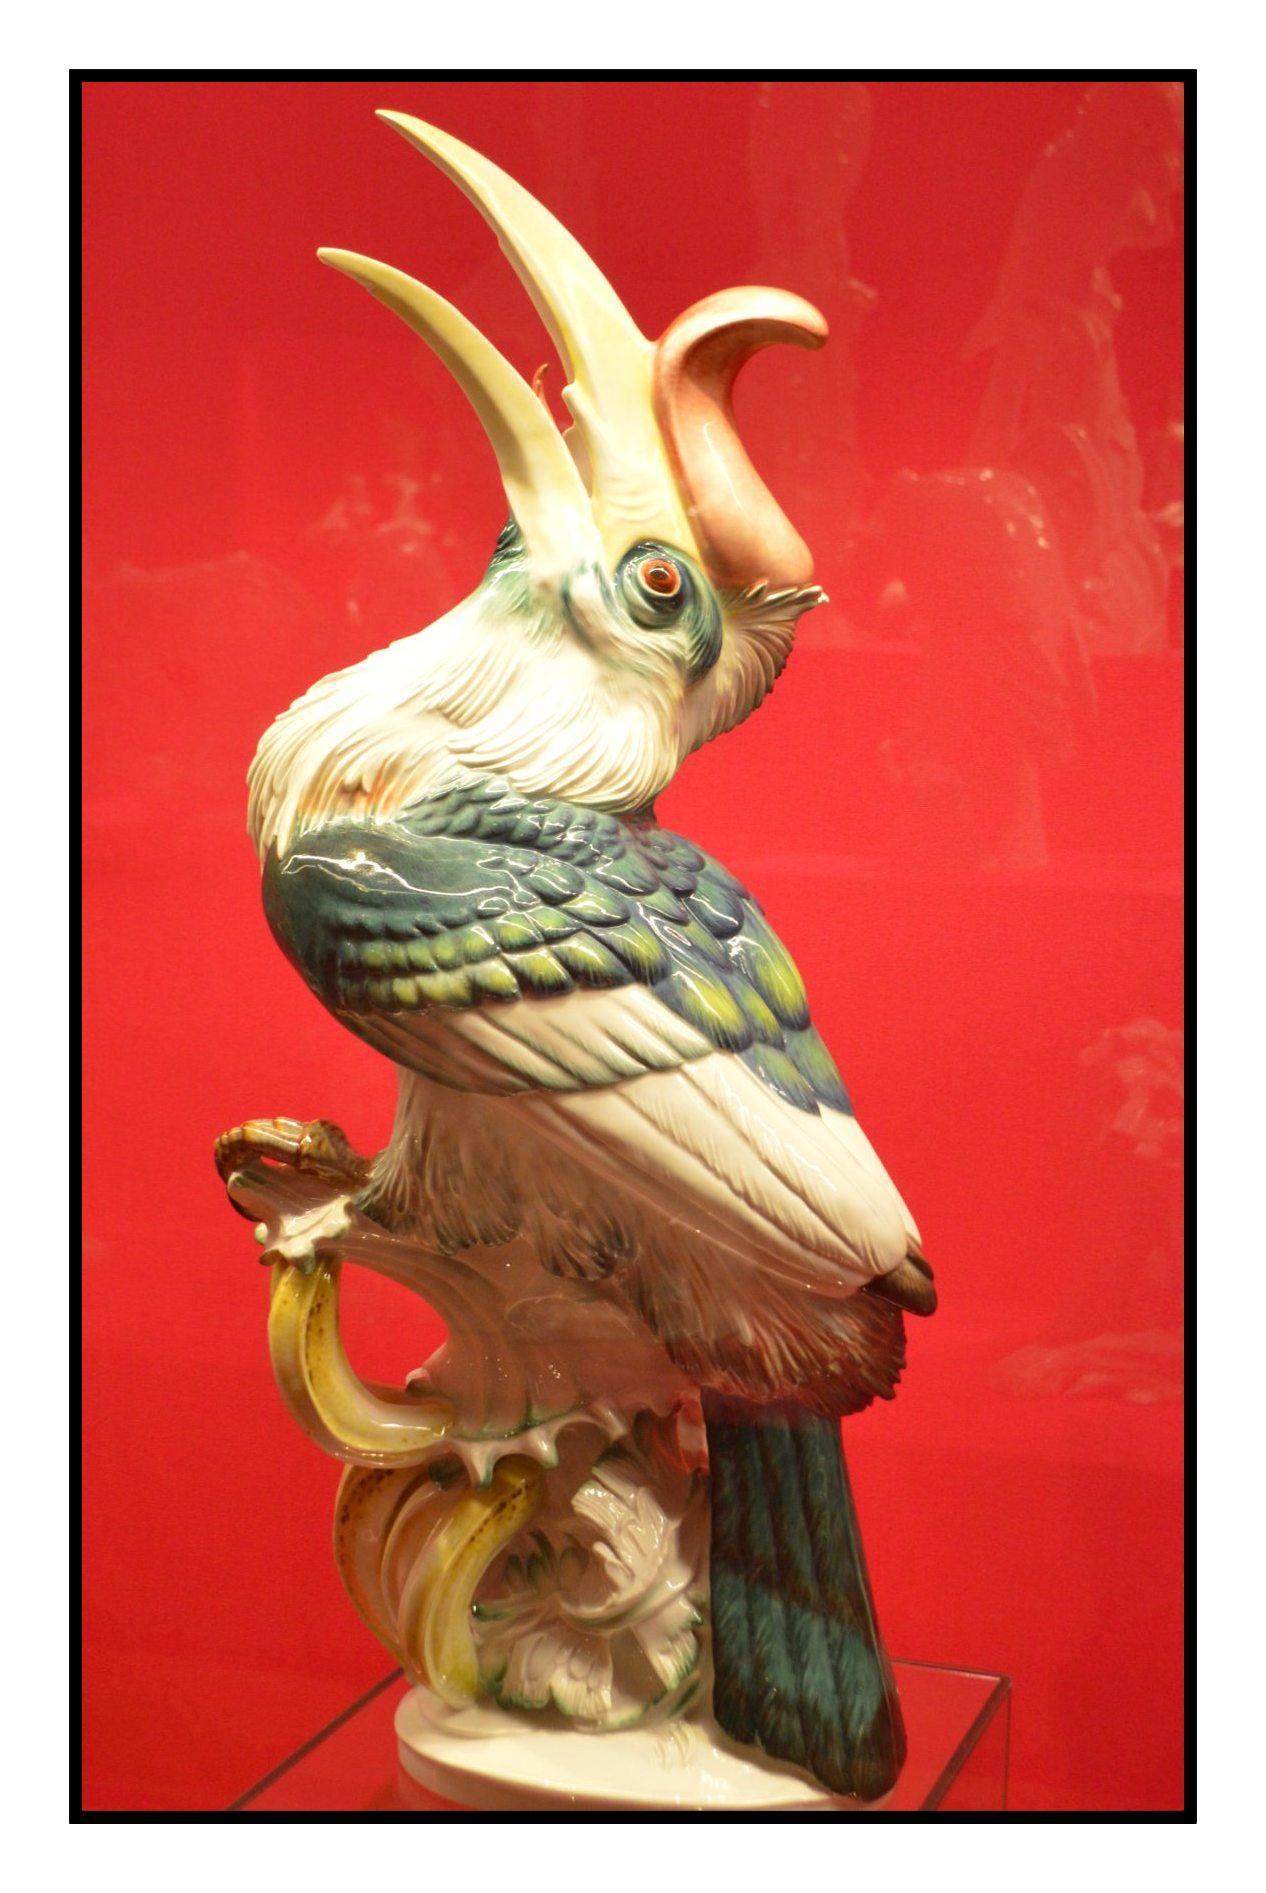 Porcelain Birds from Manufactur Meißen